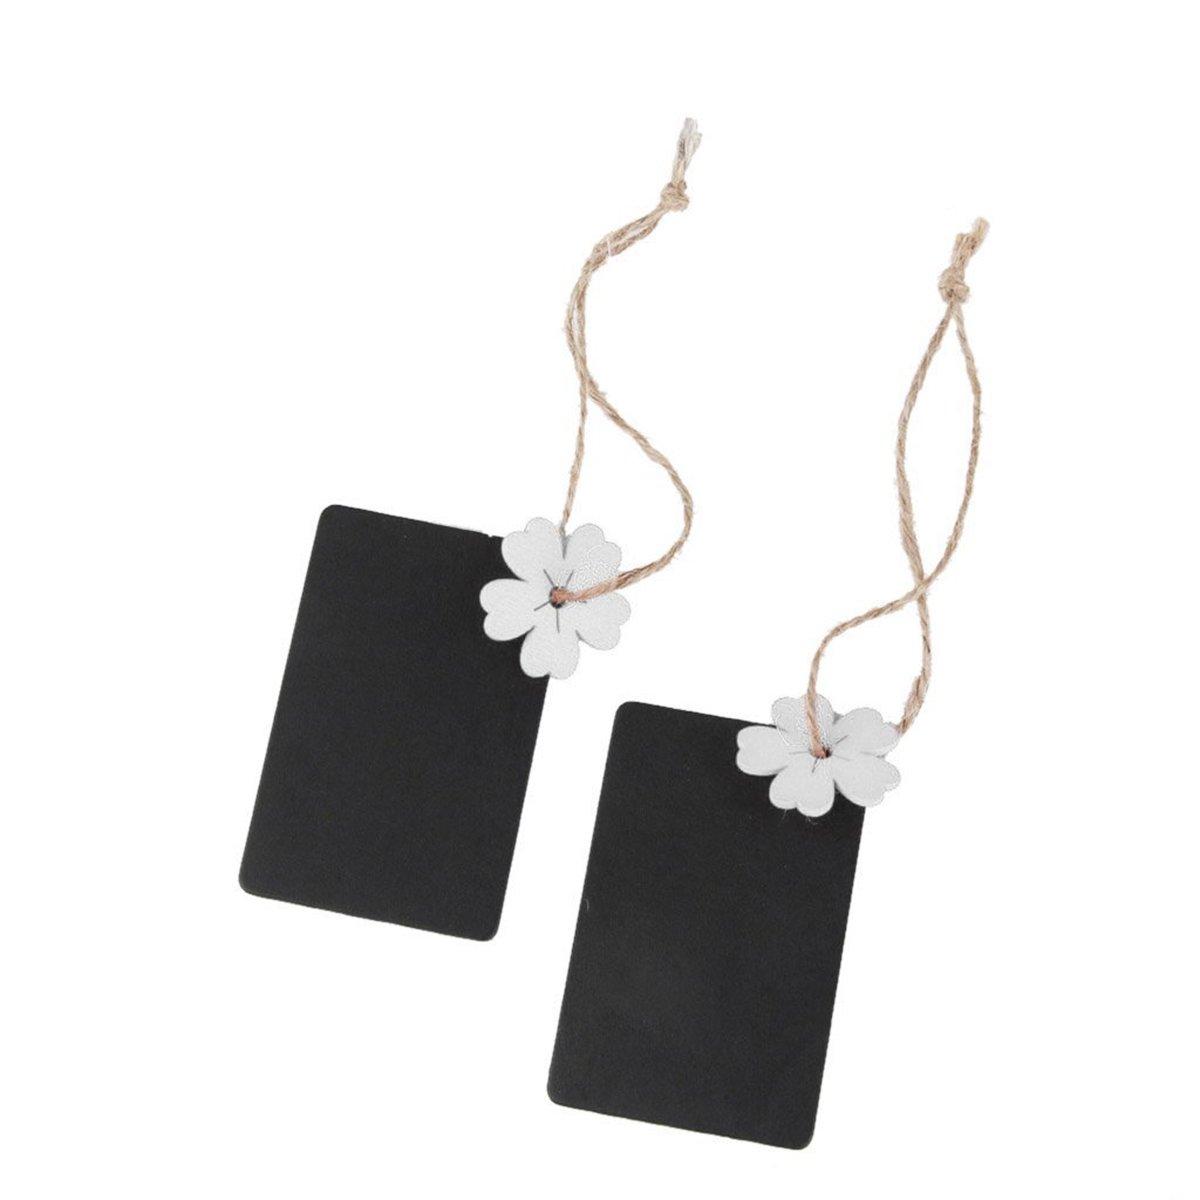 PIXNOR 10pcs color blanco flor Mini rectangular para colgar de madera pizarra para tarjetas de boda Favor etiqueta de regalo